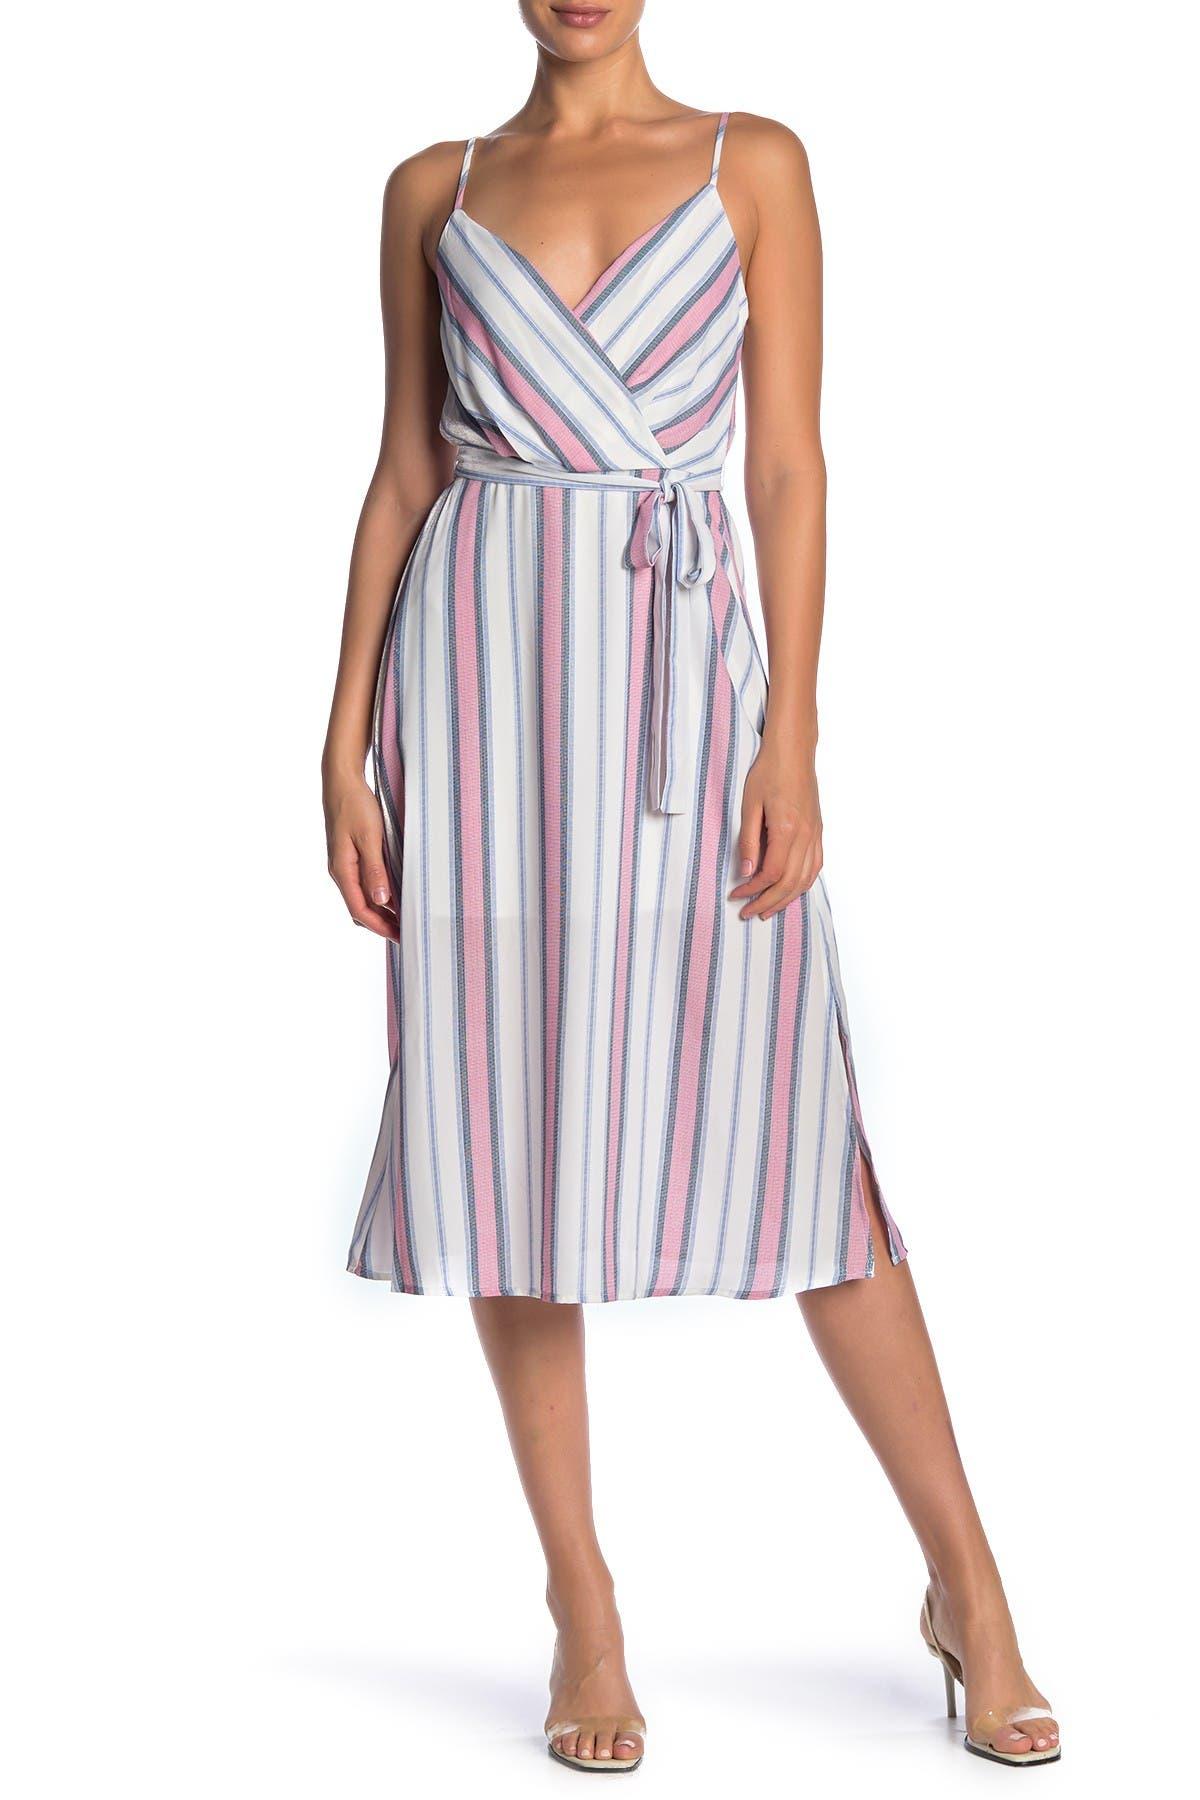 Image of ROW A Stripe Print Midi Dress